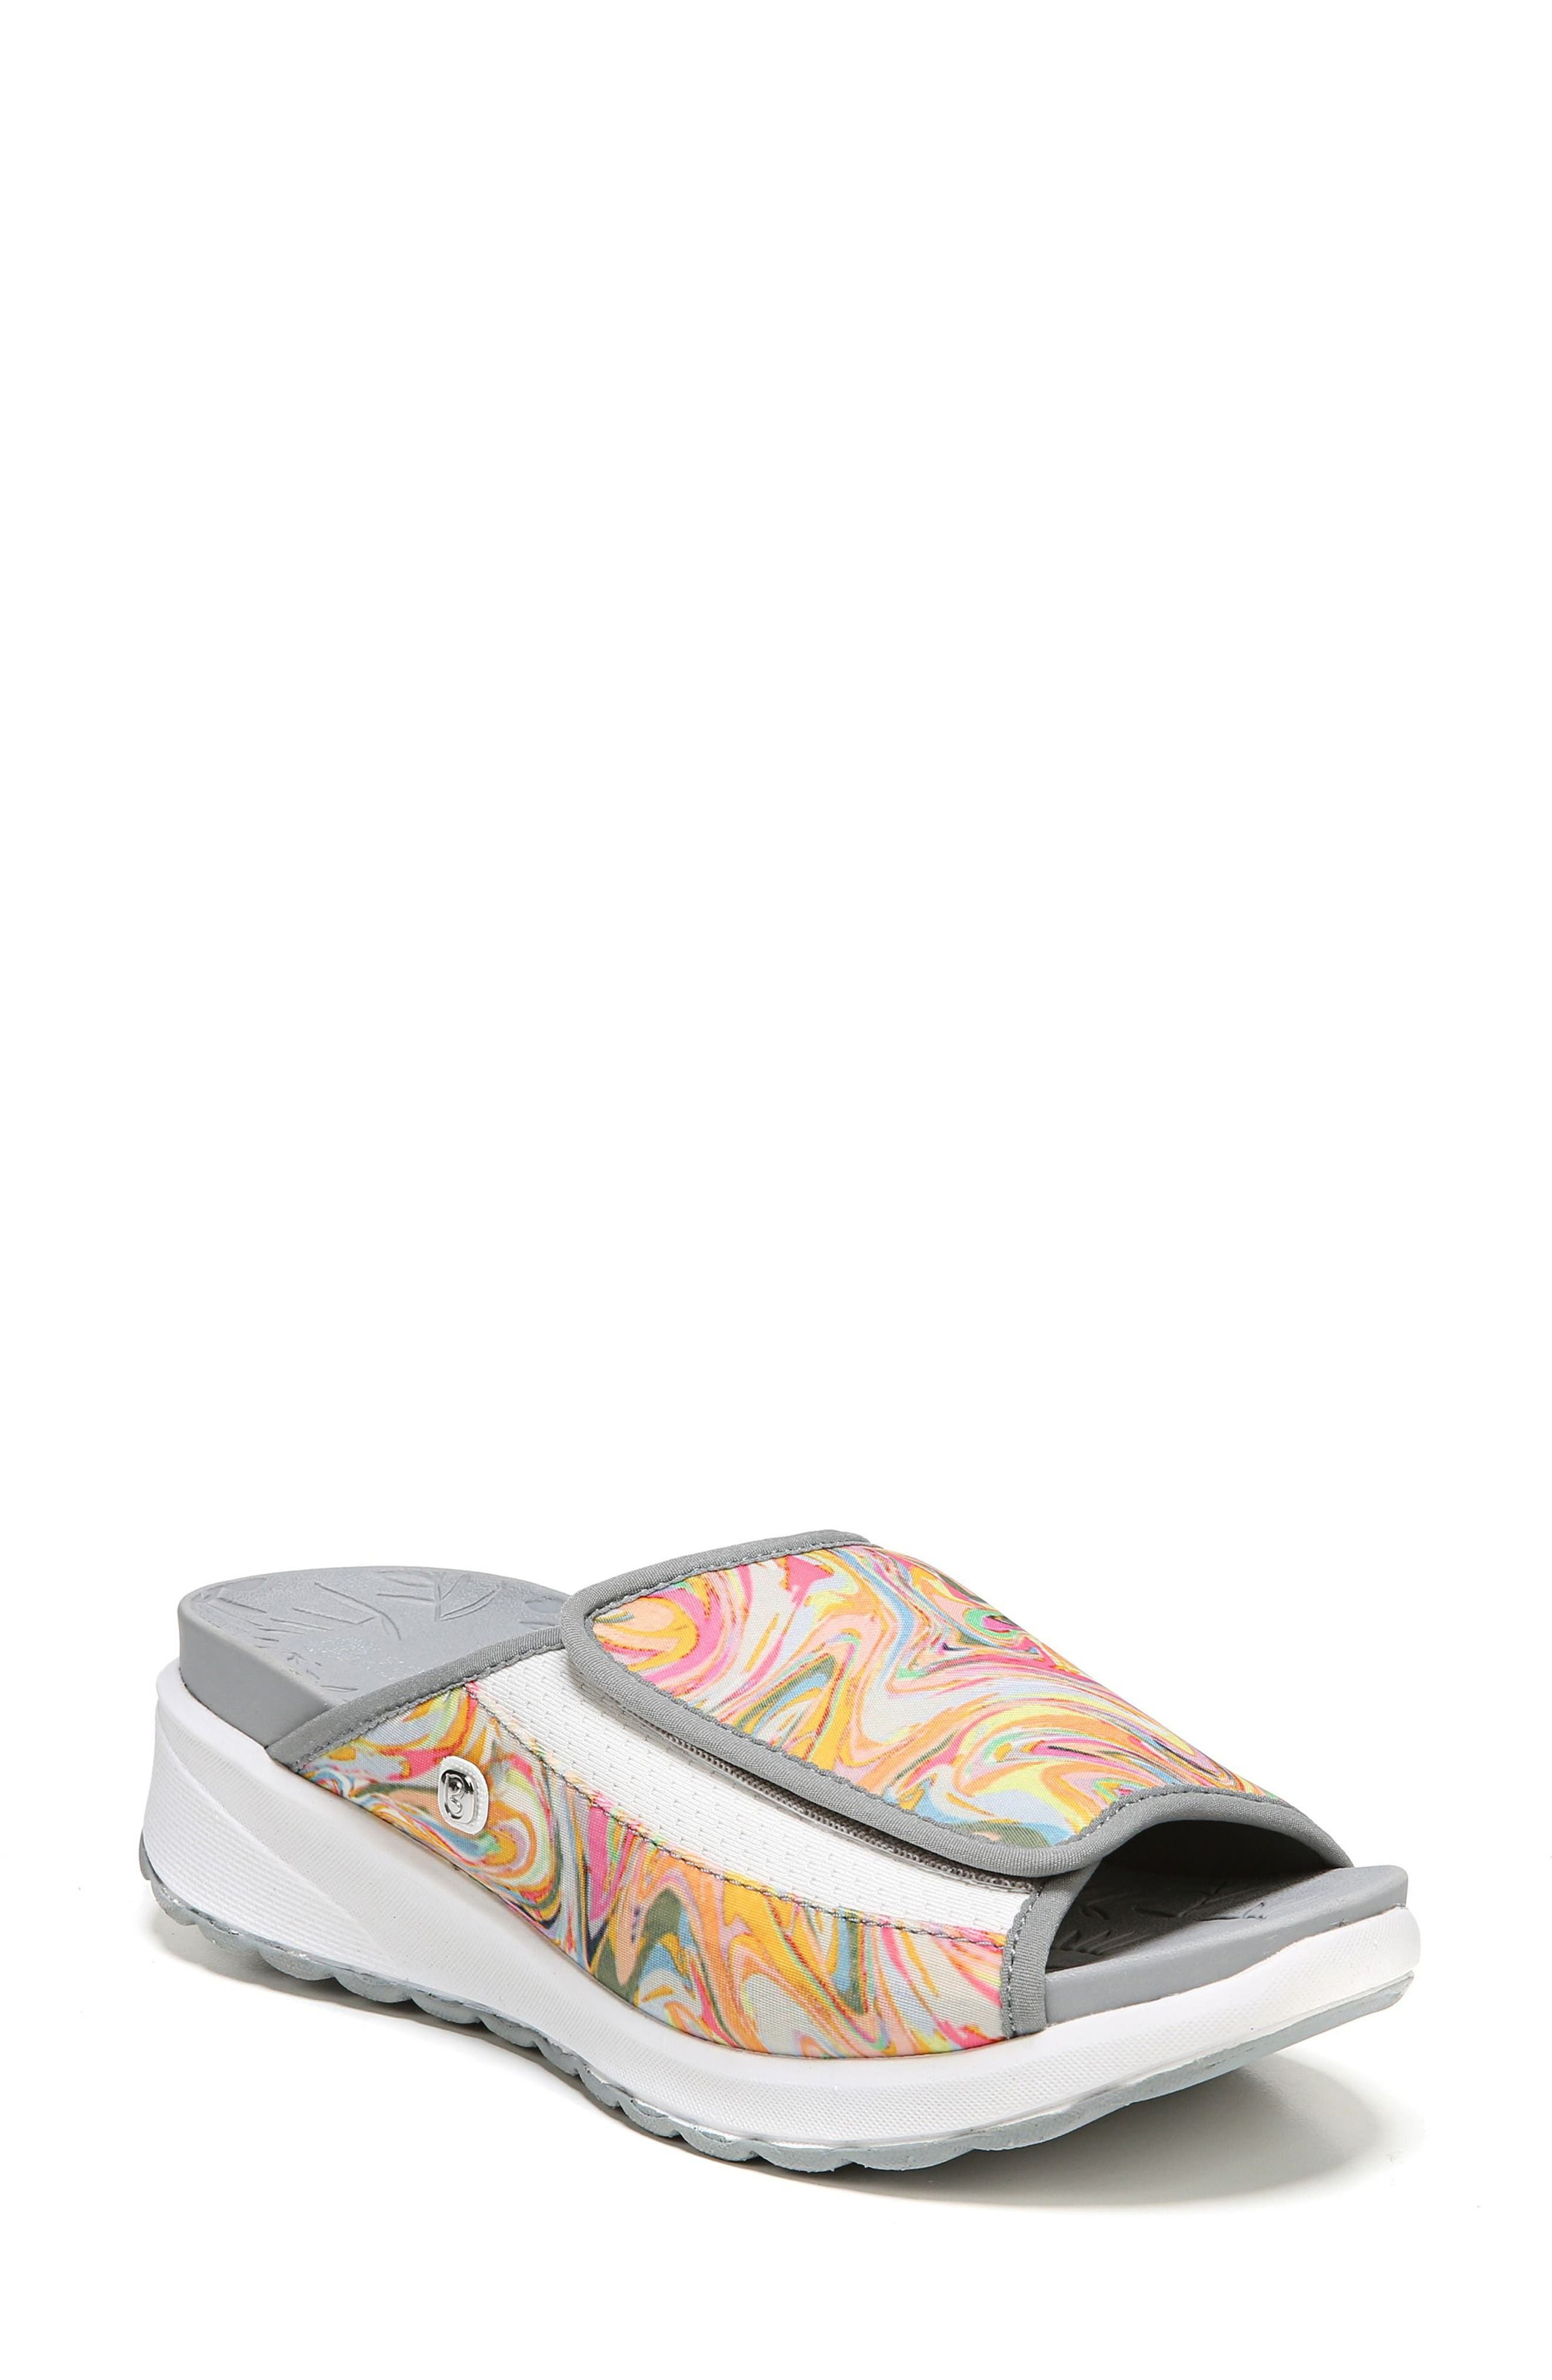 Galaxy Slide Sandal,                             Main thumbnail 1, color,                             Lava Fabric